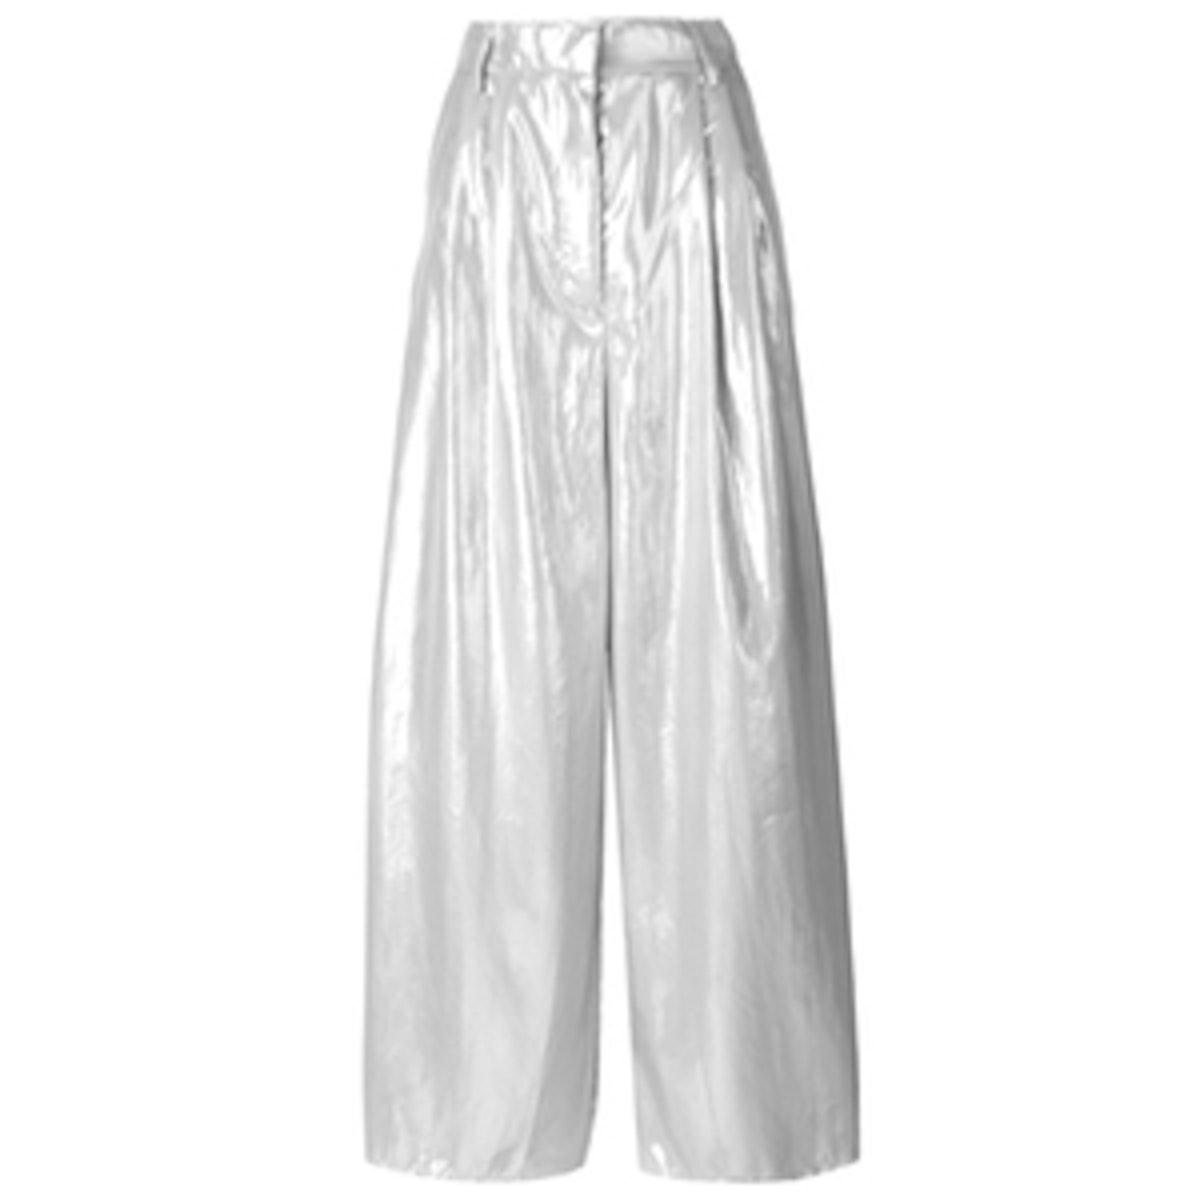 Metallic Wide Leg Trousers